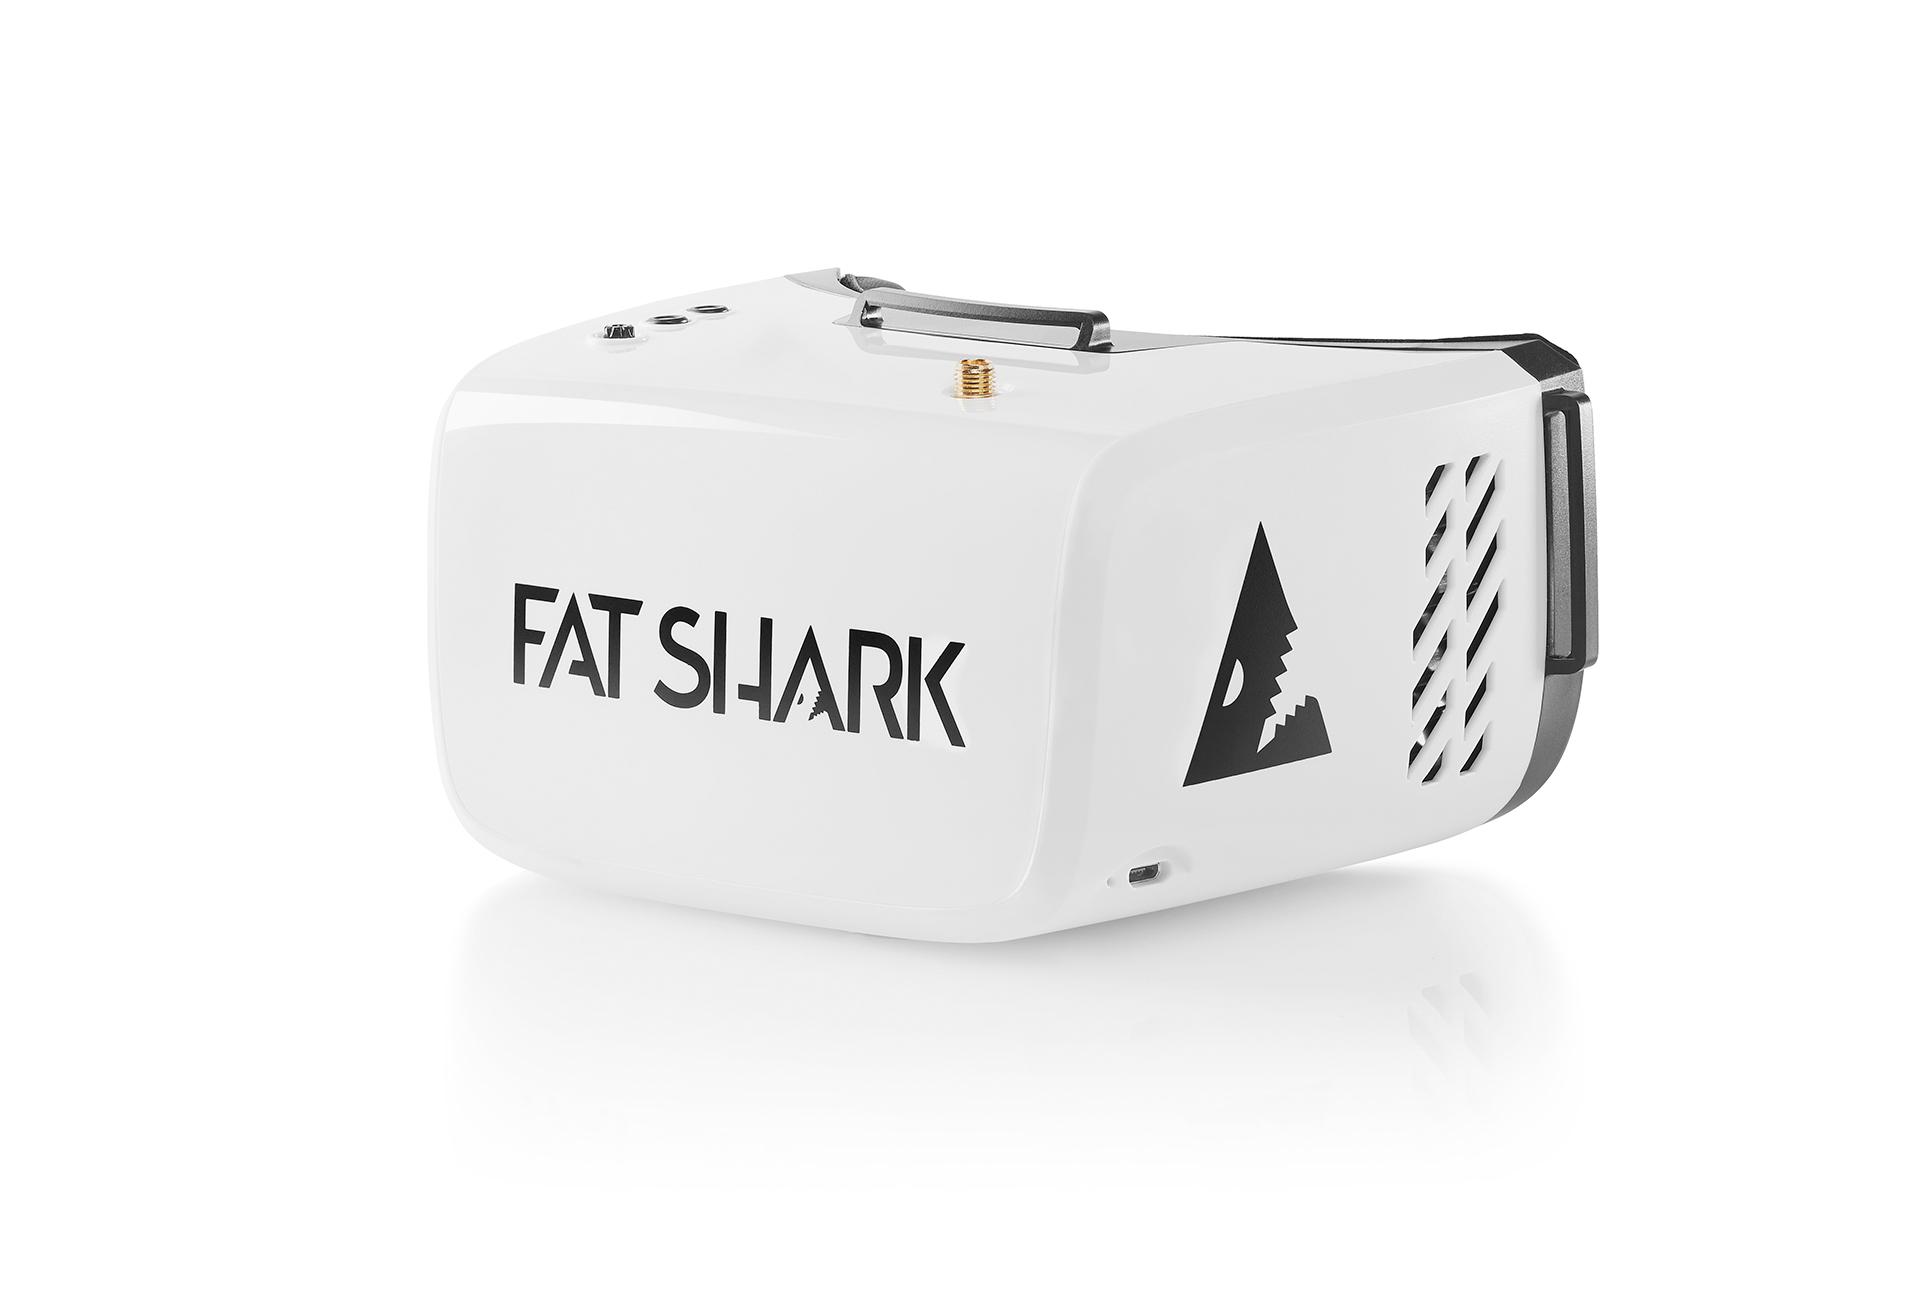 FatShark_Goggle_45-Angle.jpg